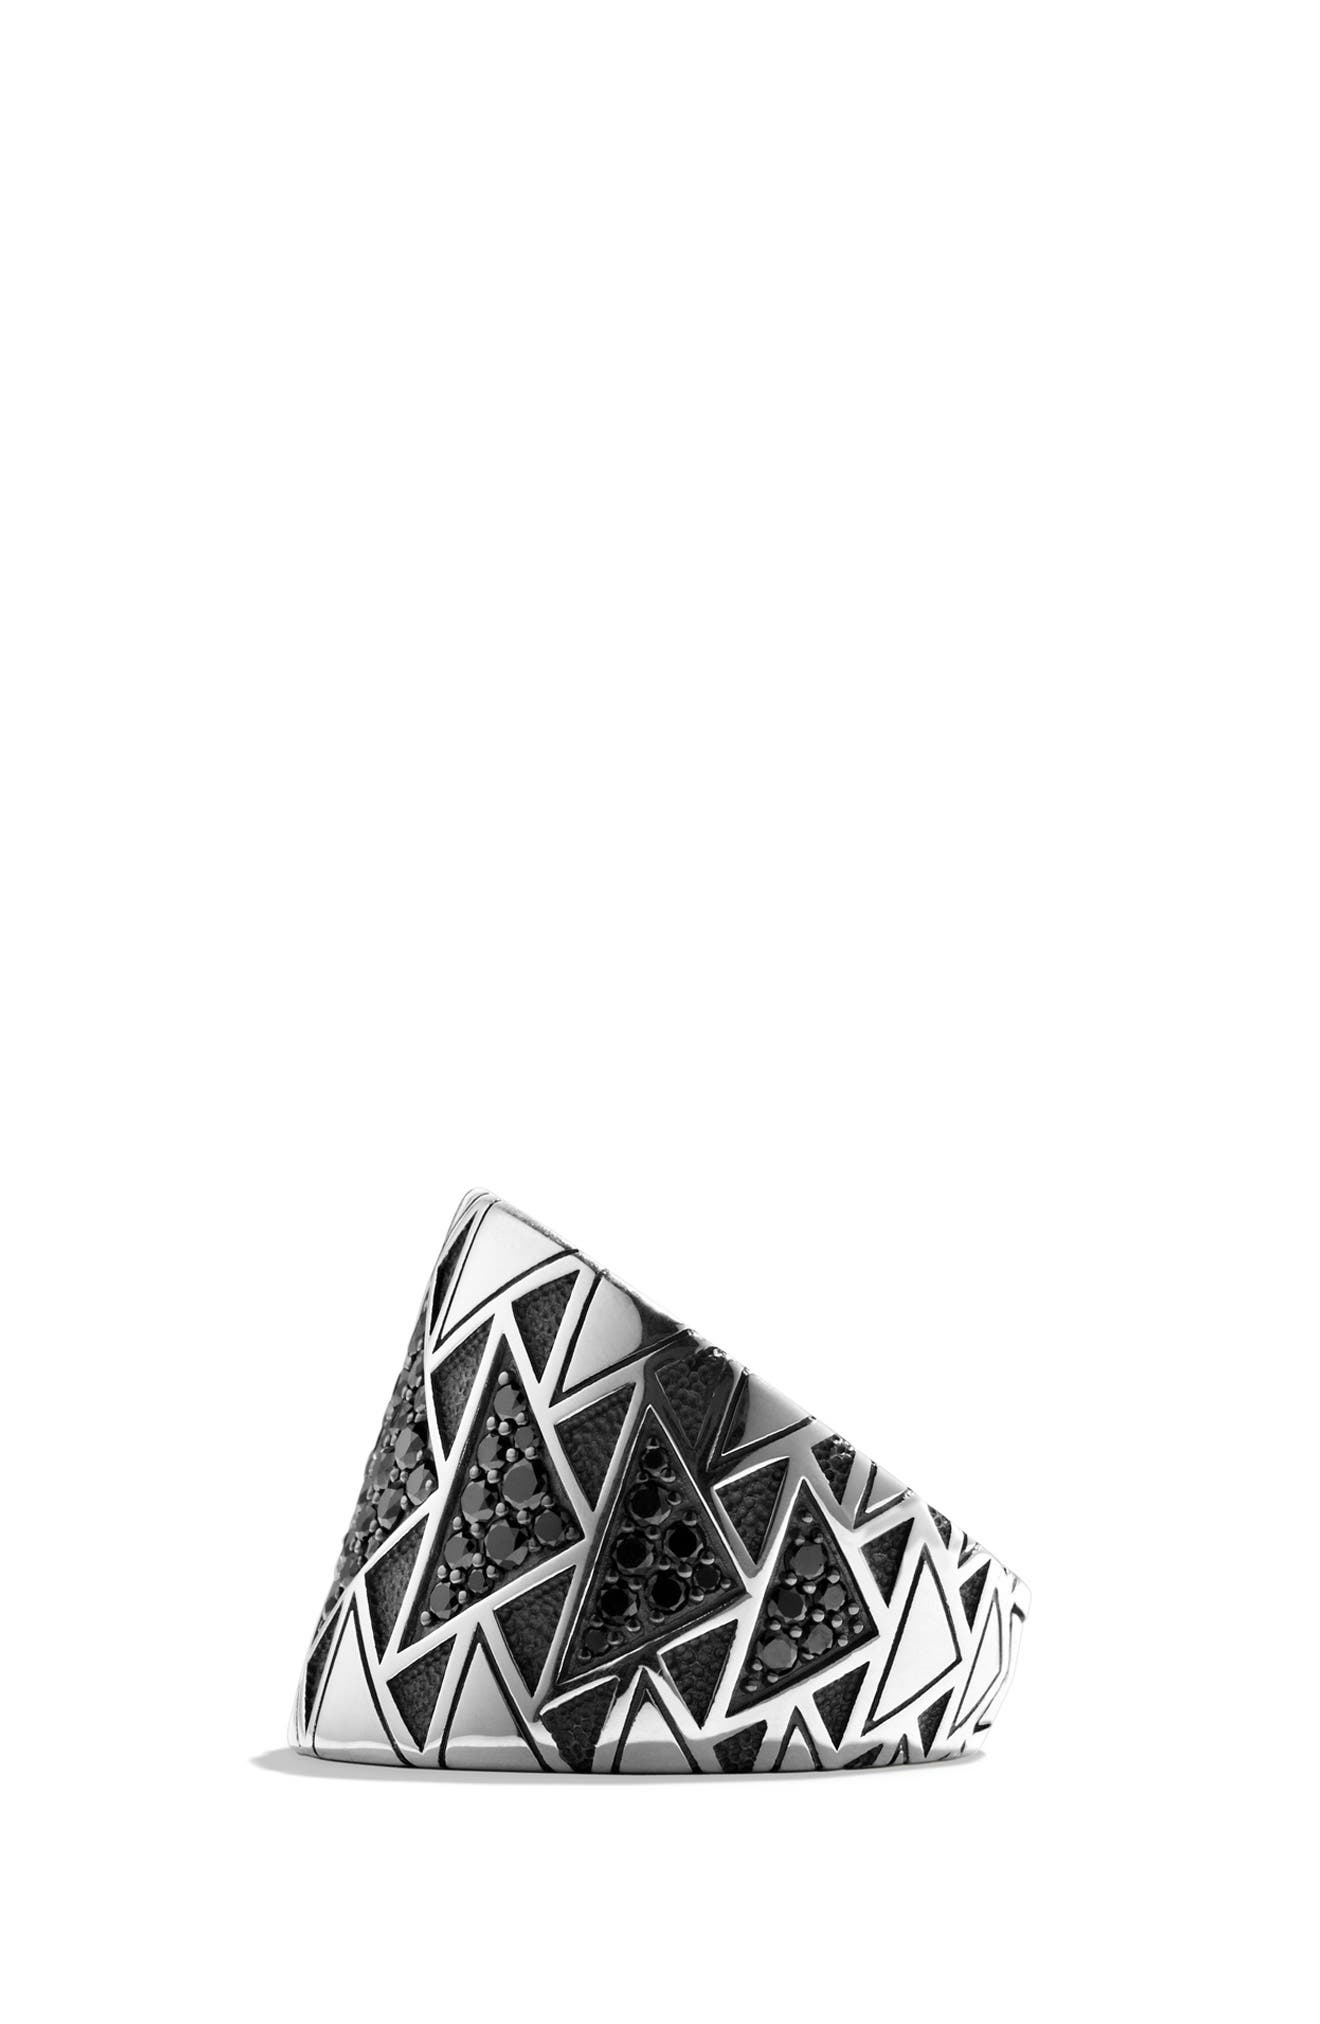 Southwest Signet Ring with Black Diamonds,                             Alternate thumbnail 10, color,